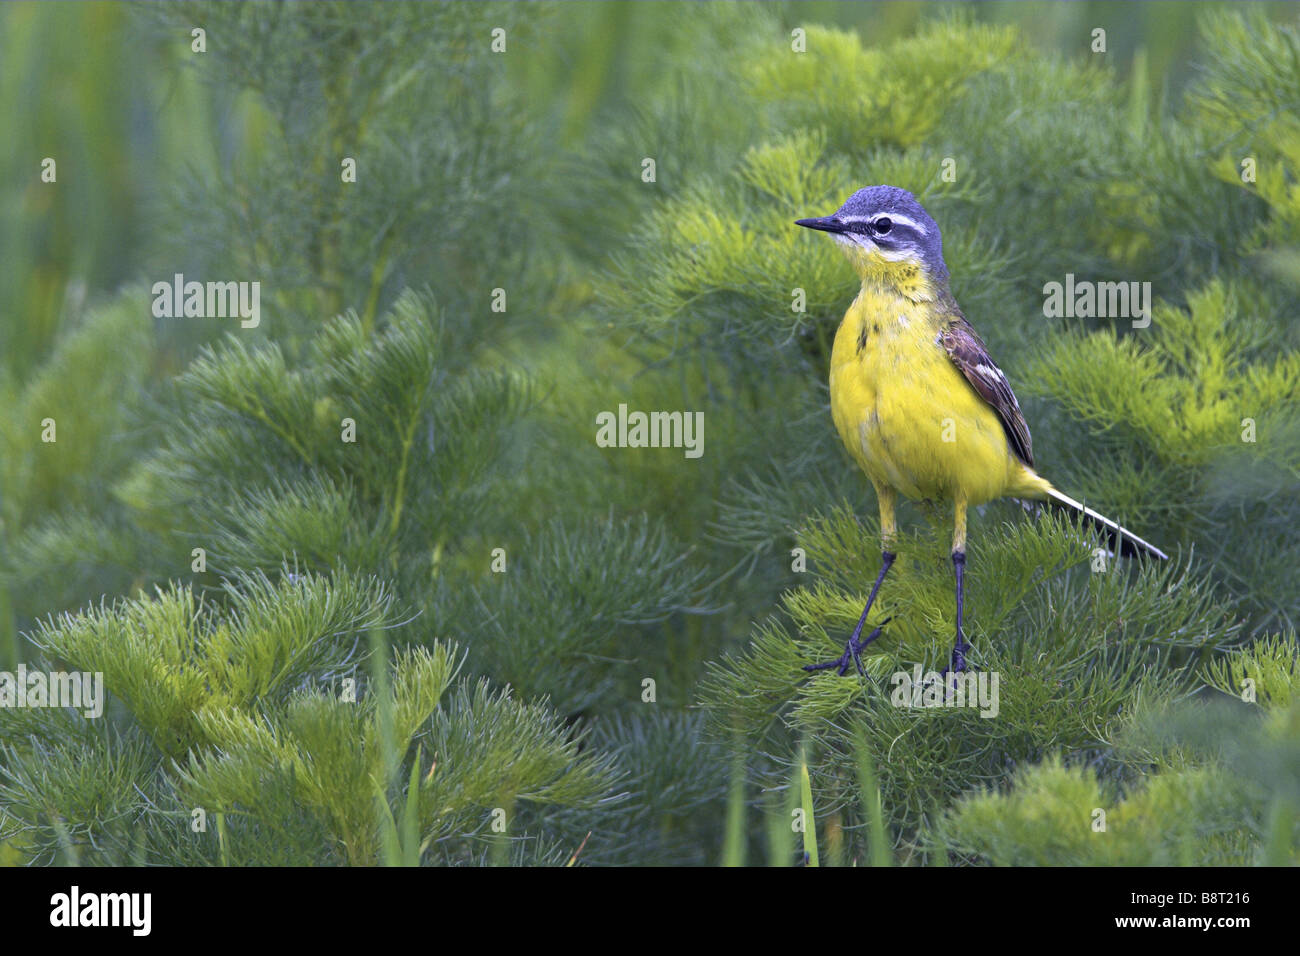 Blue-headed Wagtail, Yellow Wagtail (Motacilla flava flava), sitting in shrubbery, Germany, Rhineland-Palatinate - Stock Image